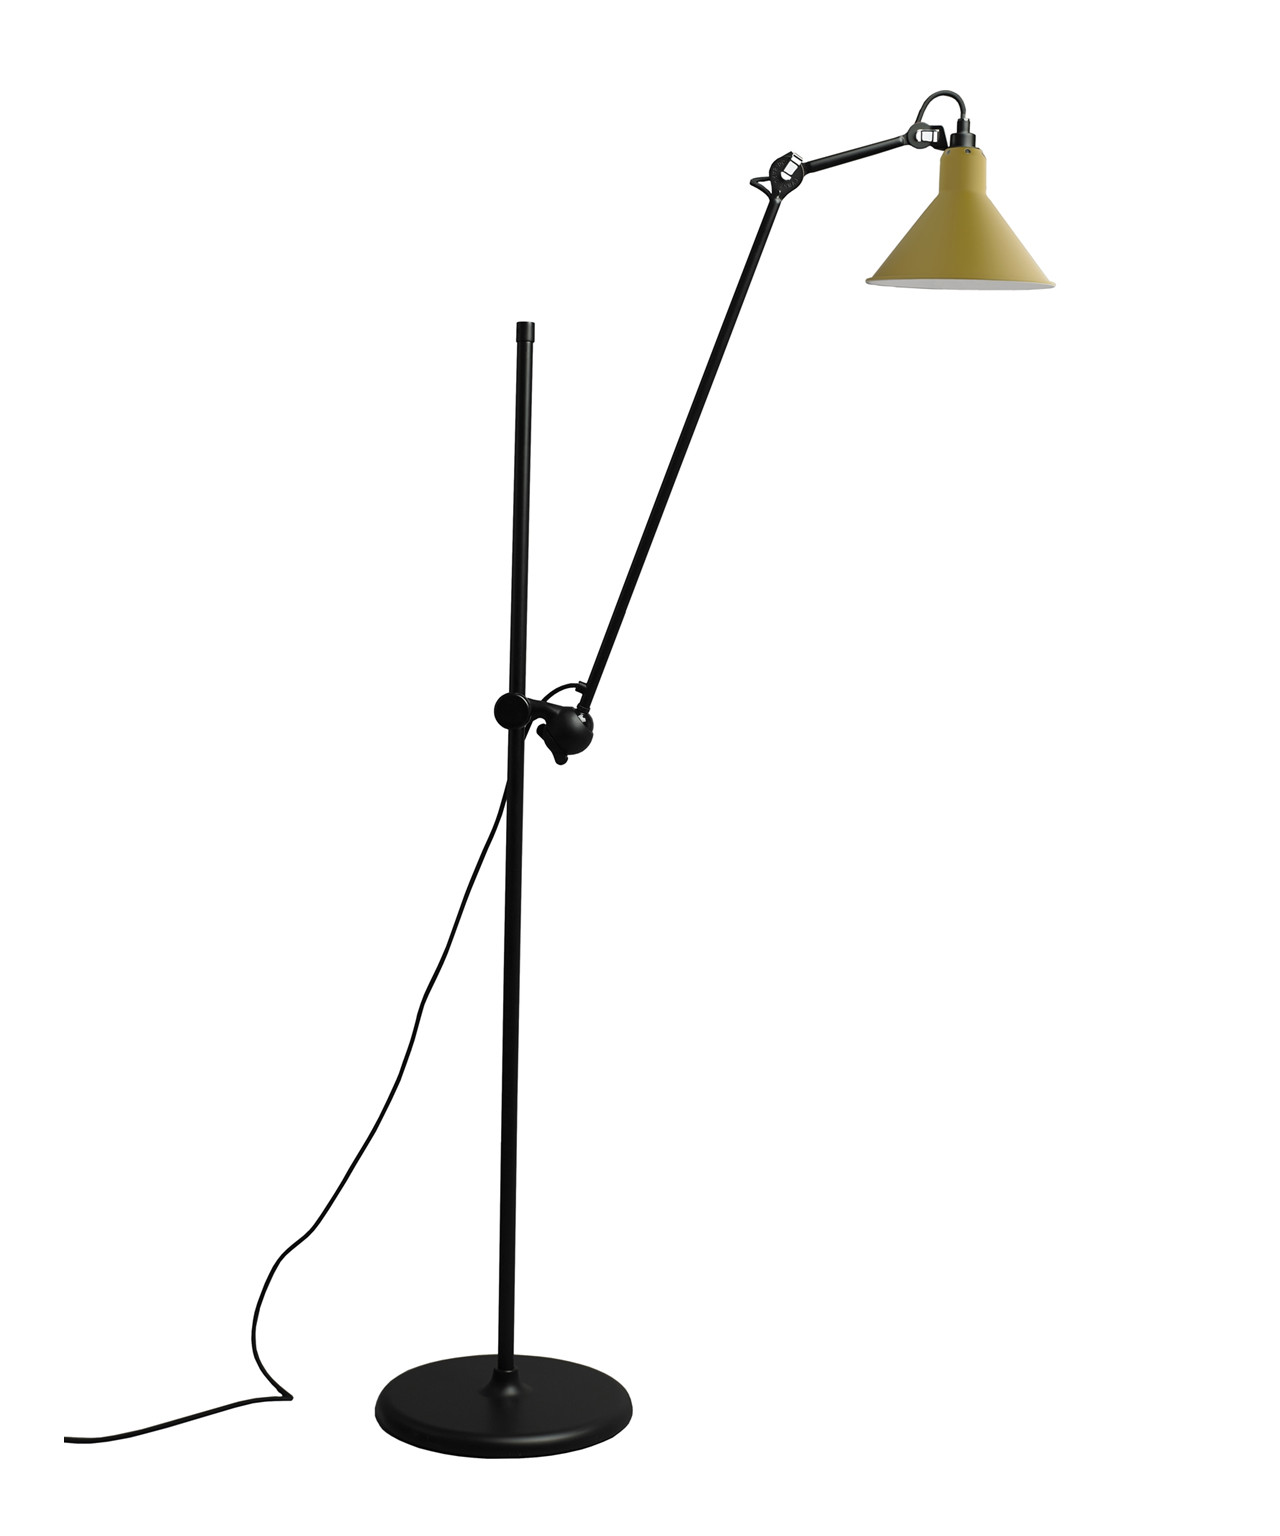 Image of   215 Gulvlampe Gul - Lampe Gras